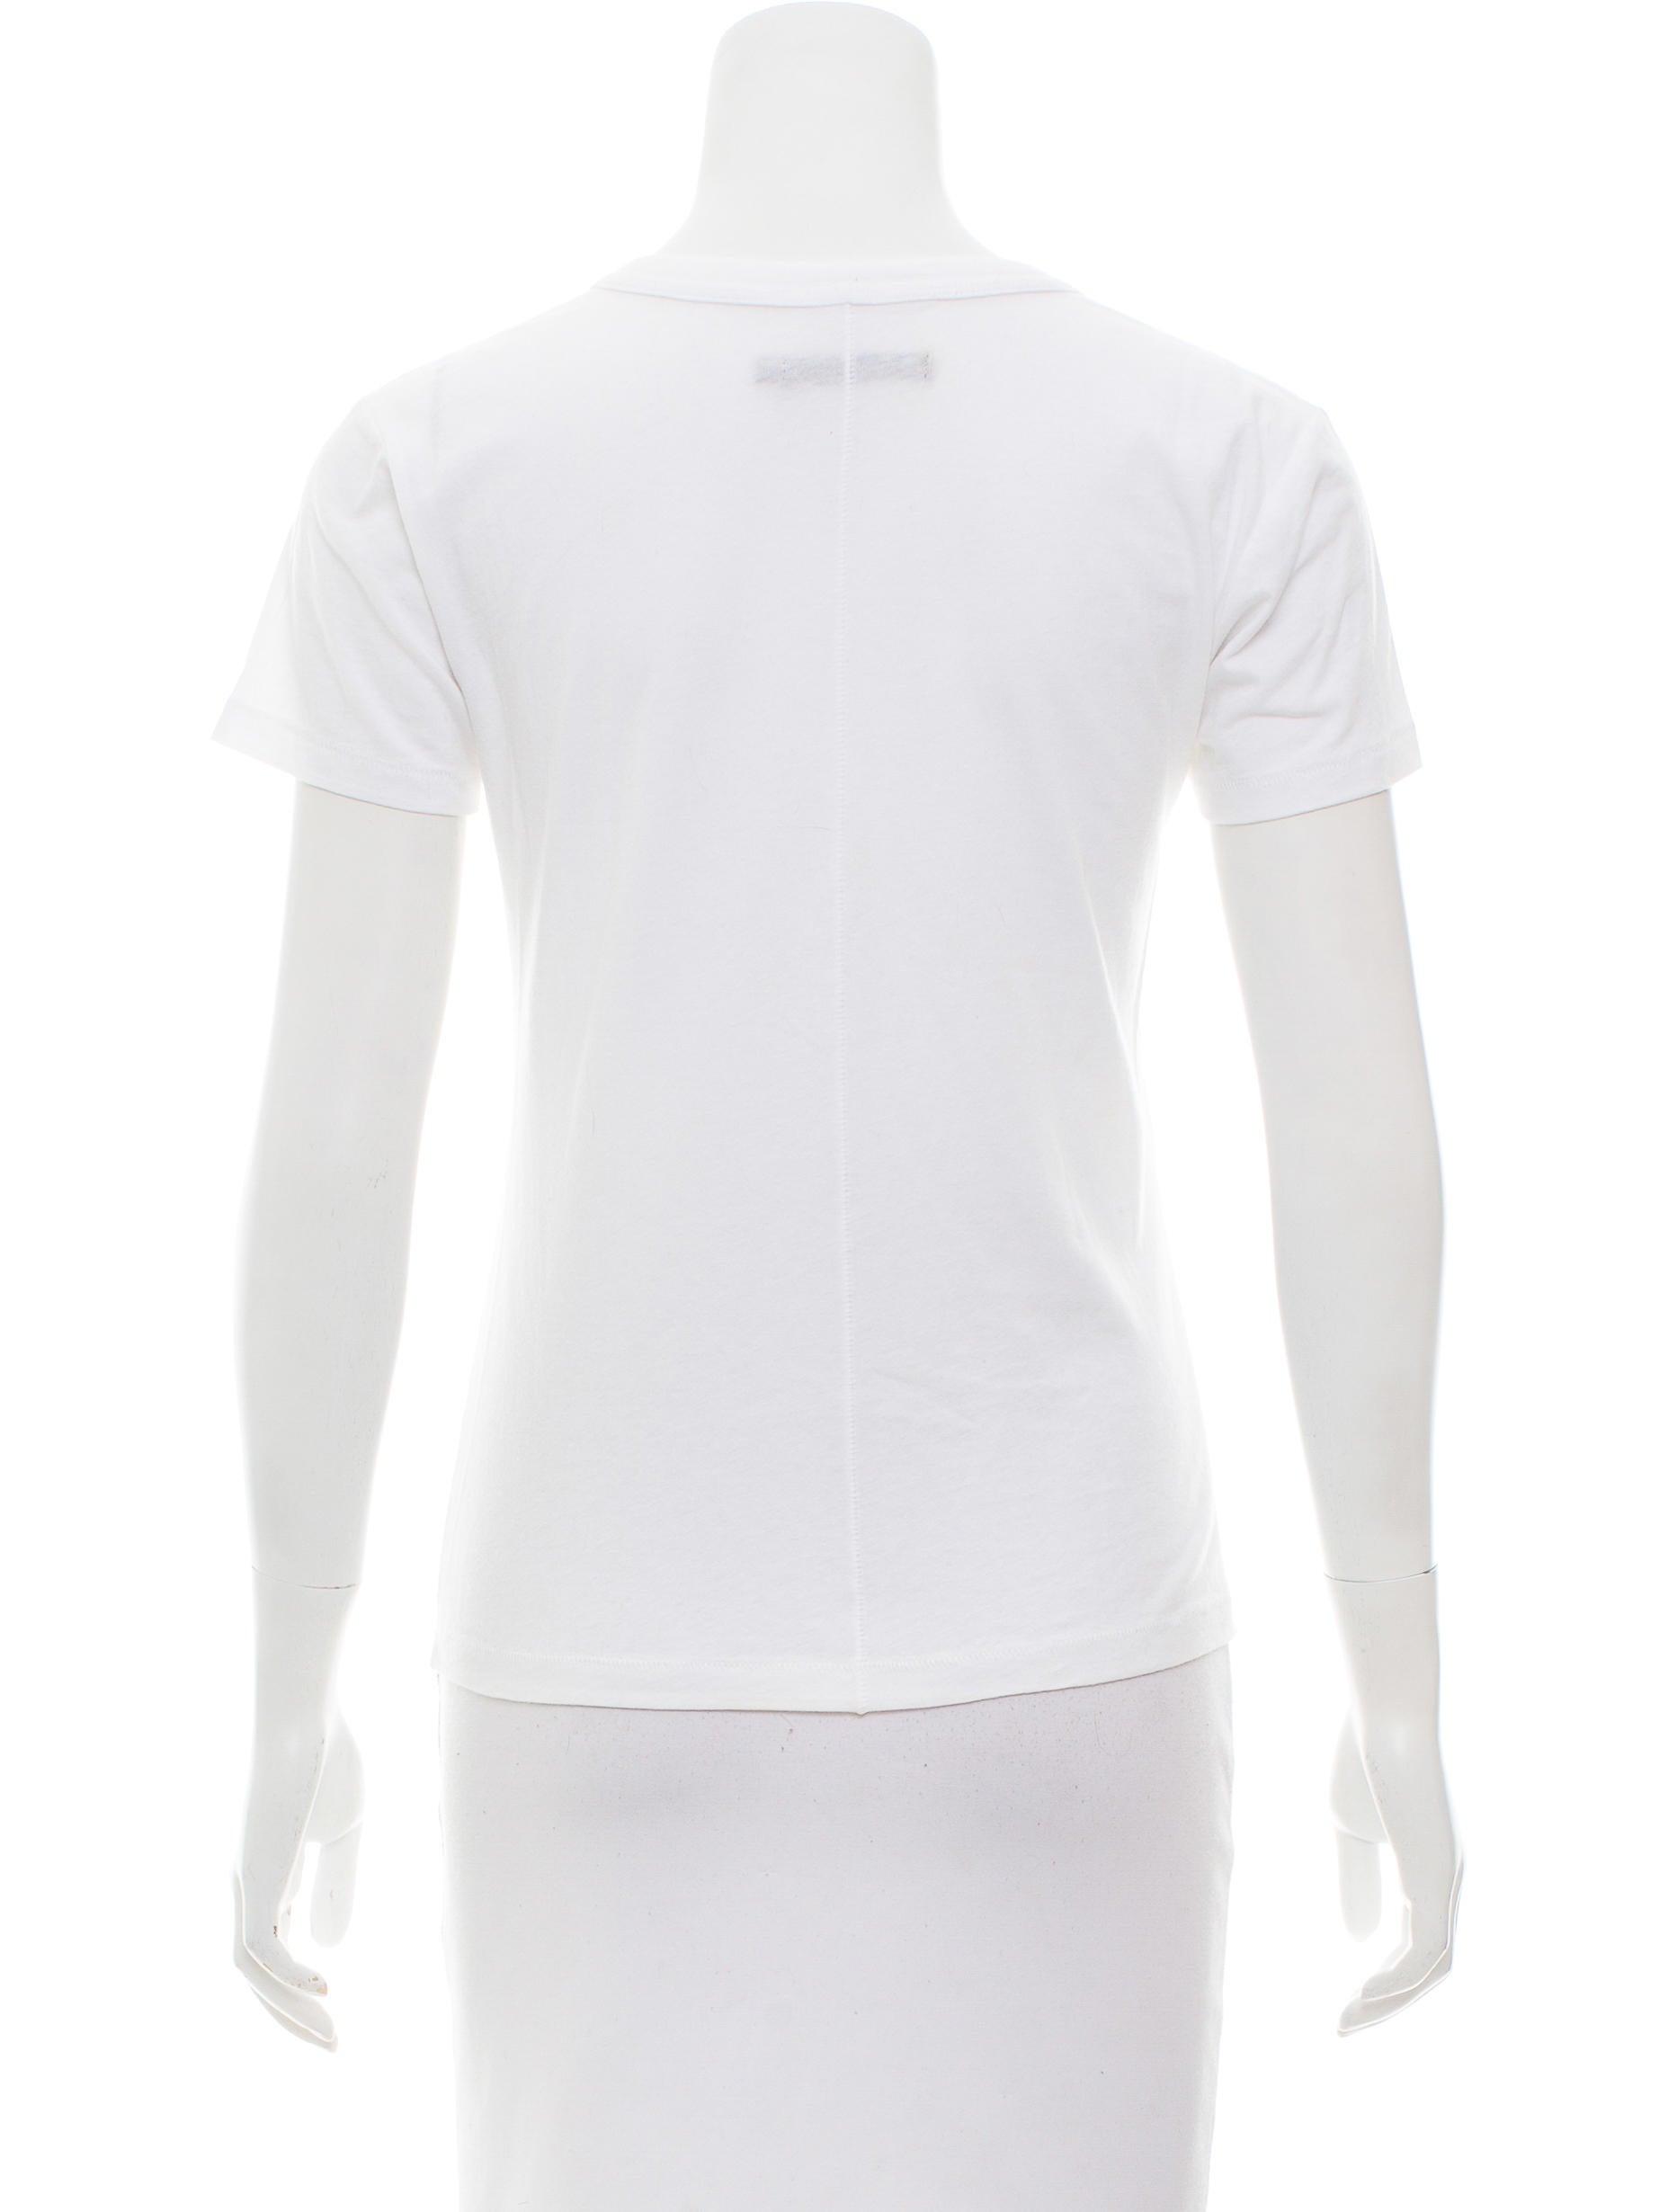 Rag bone knit crew neck t shirt clothing wragb83103 for Rag and bone white t shirt